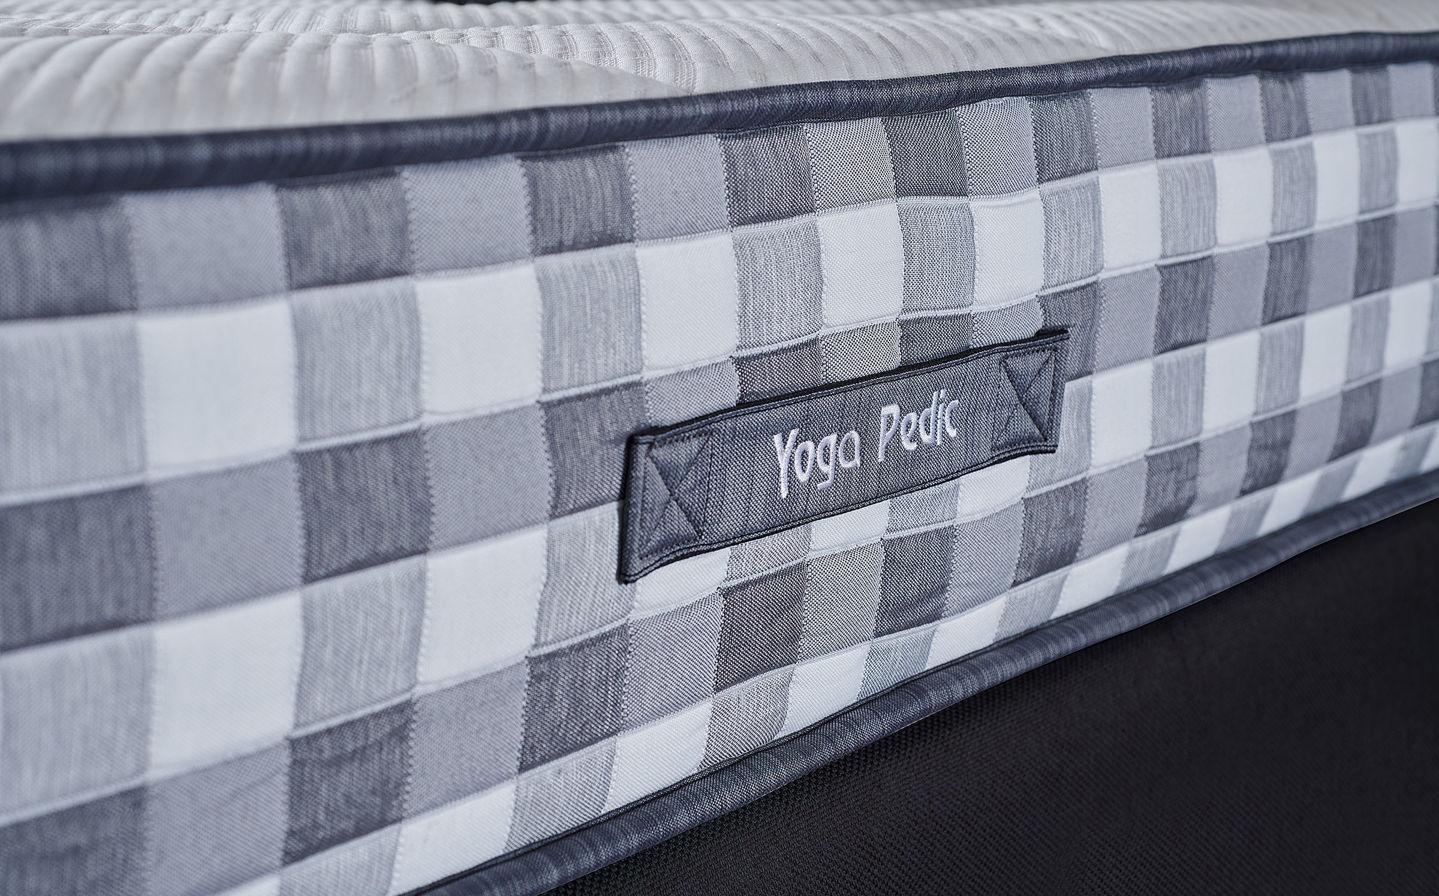 Yoga Pedic Yatak 140 X 190